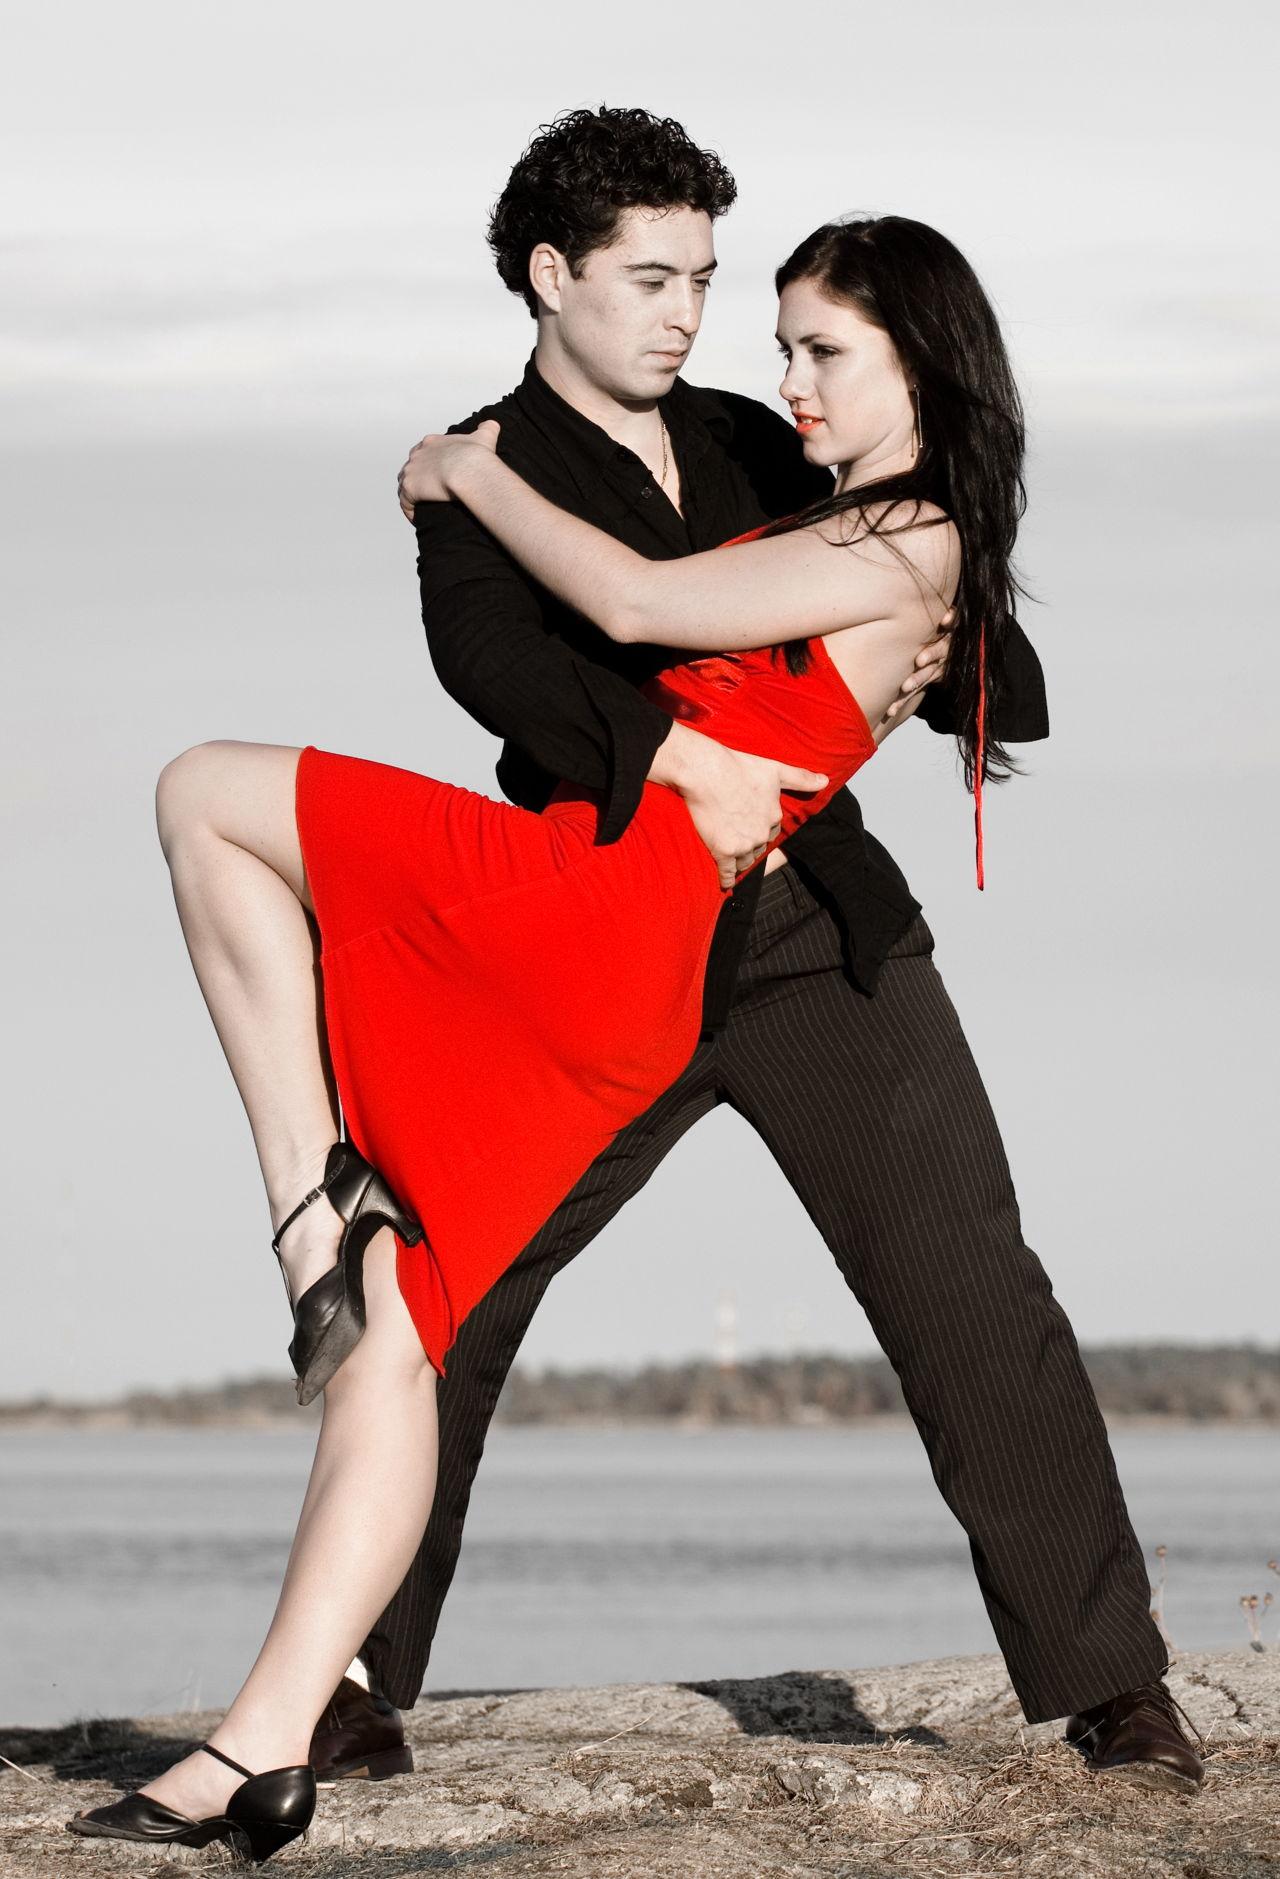 f9d33922a85f1 Dressing Up for Salsa - Silken Moves, Sleek Costumes!